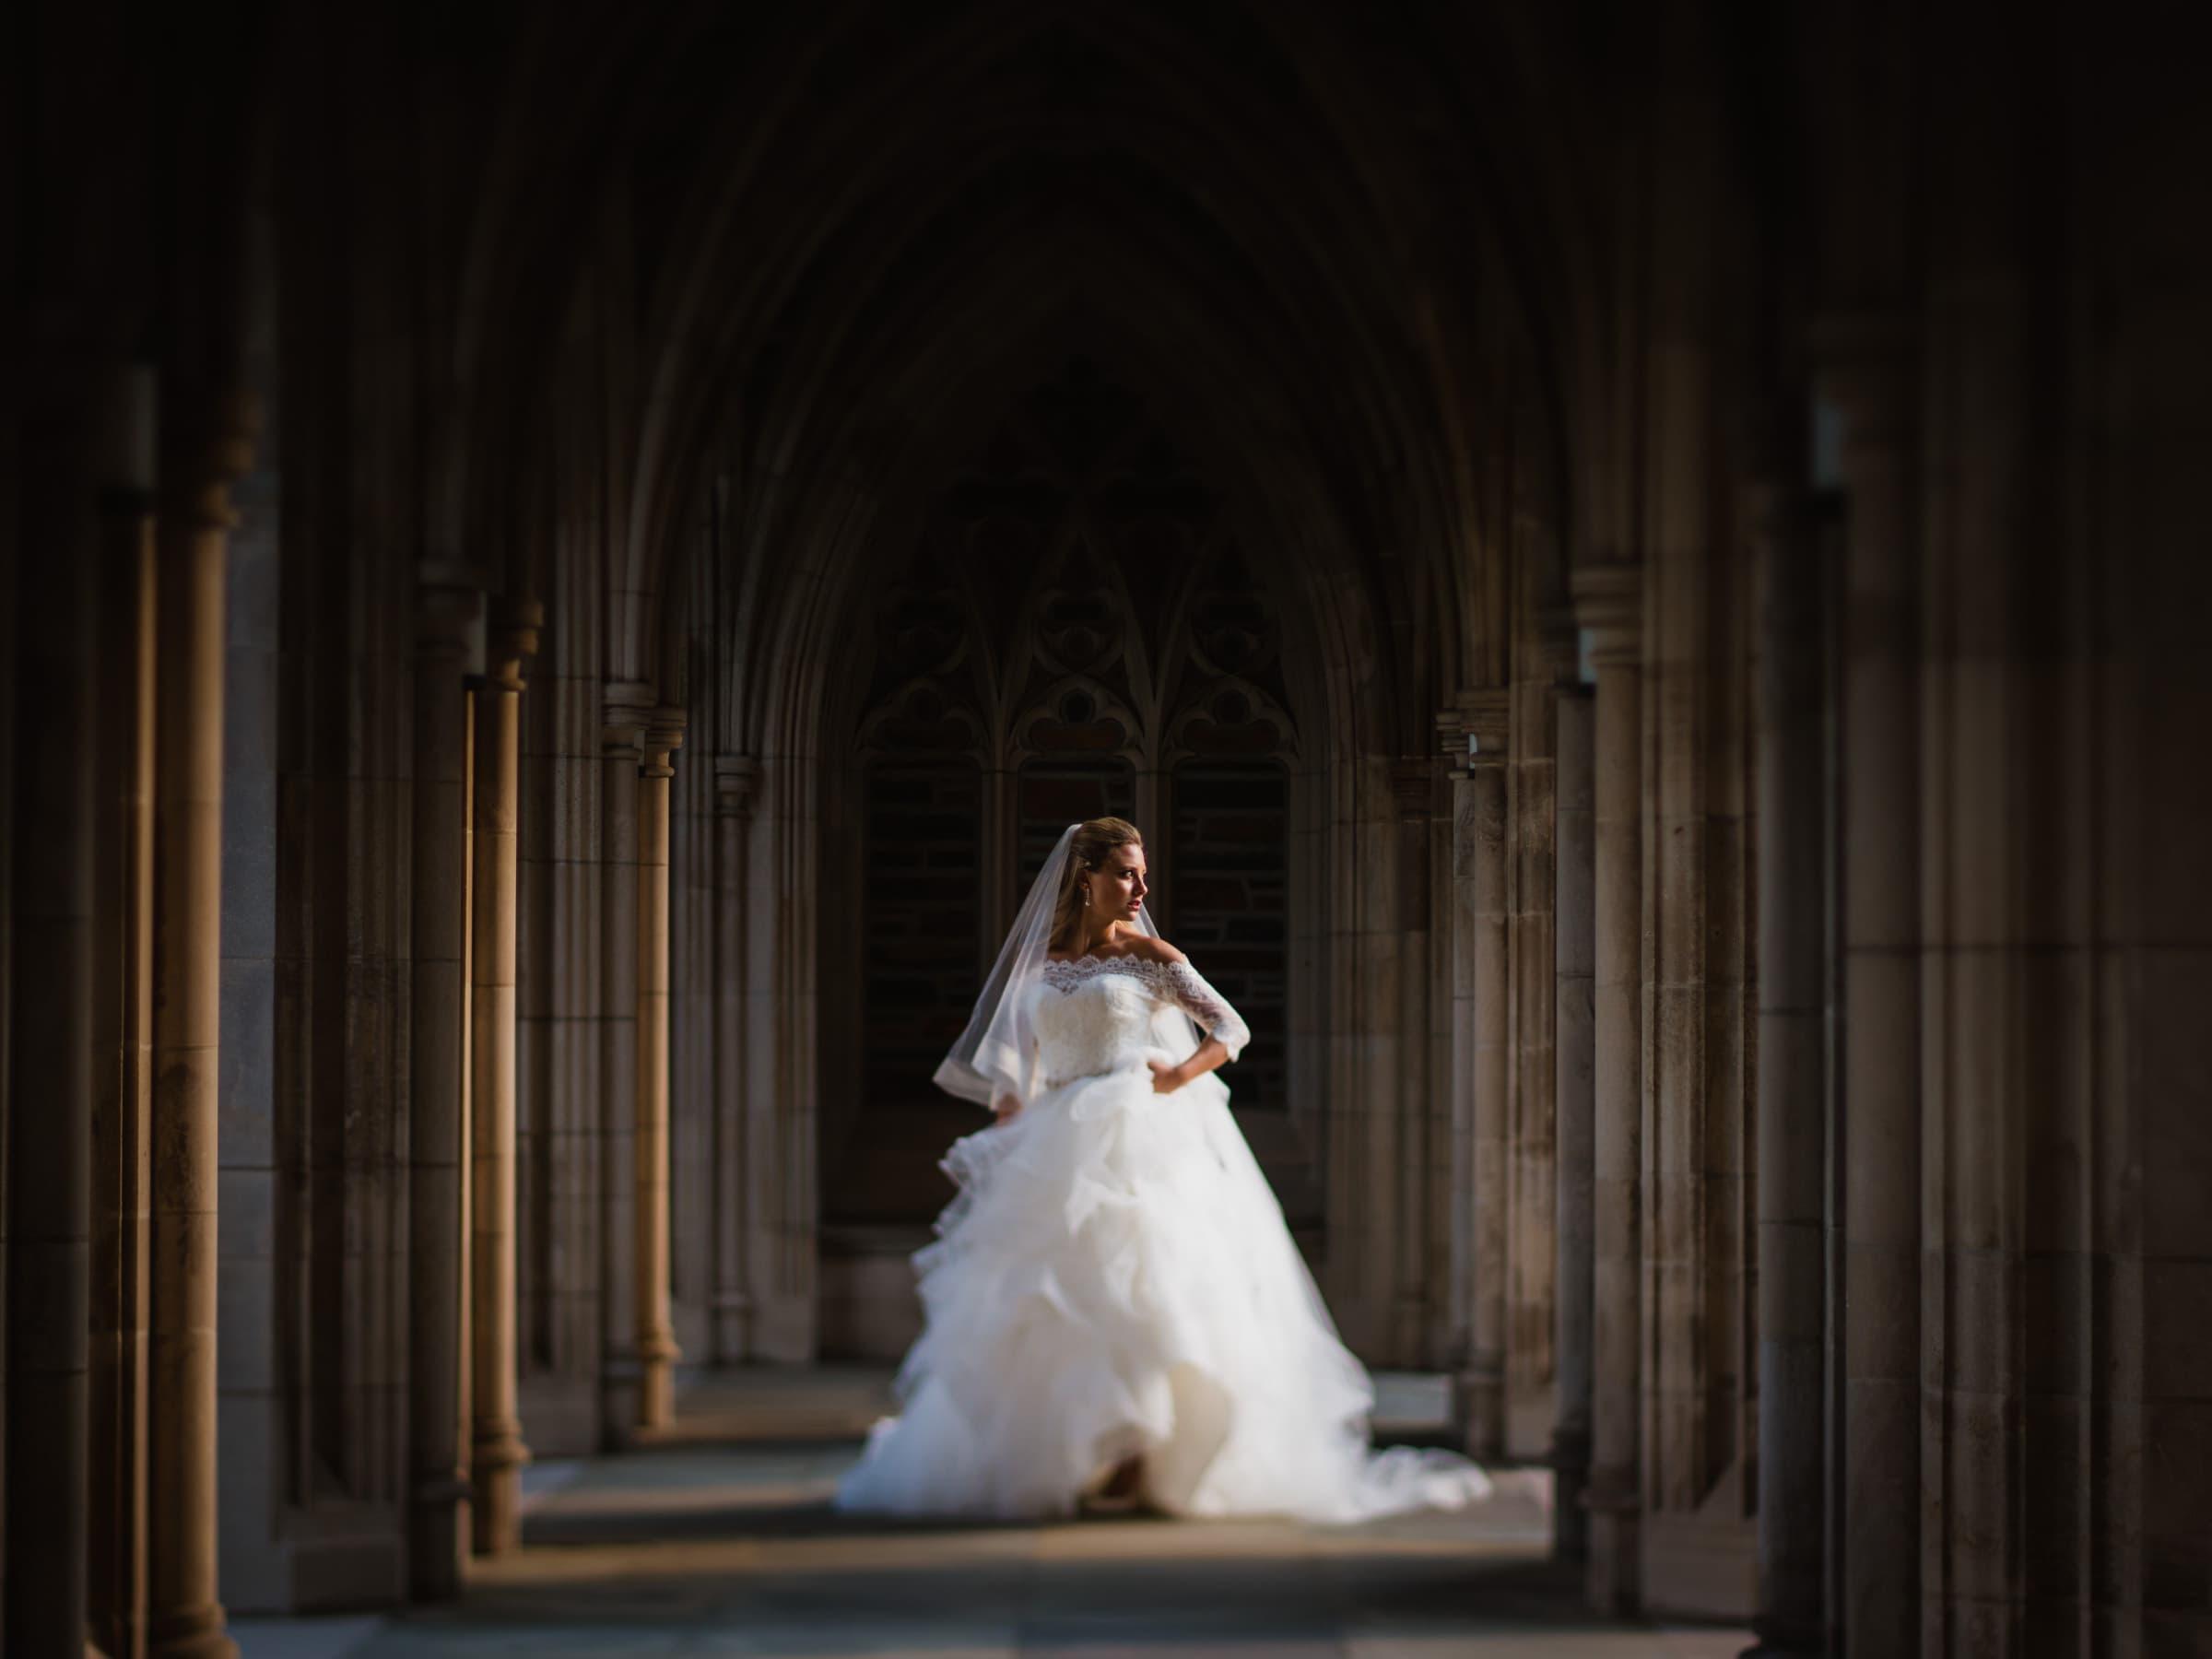 Duke Chapel Bride in Arcades Tilt Shift Lens by Joe Payne Photography